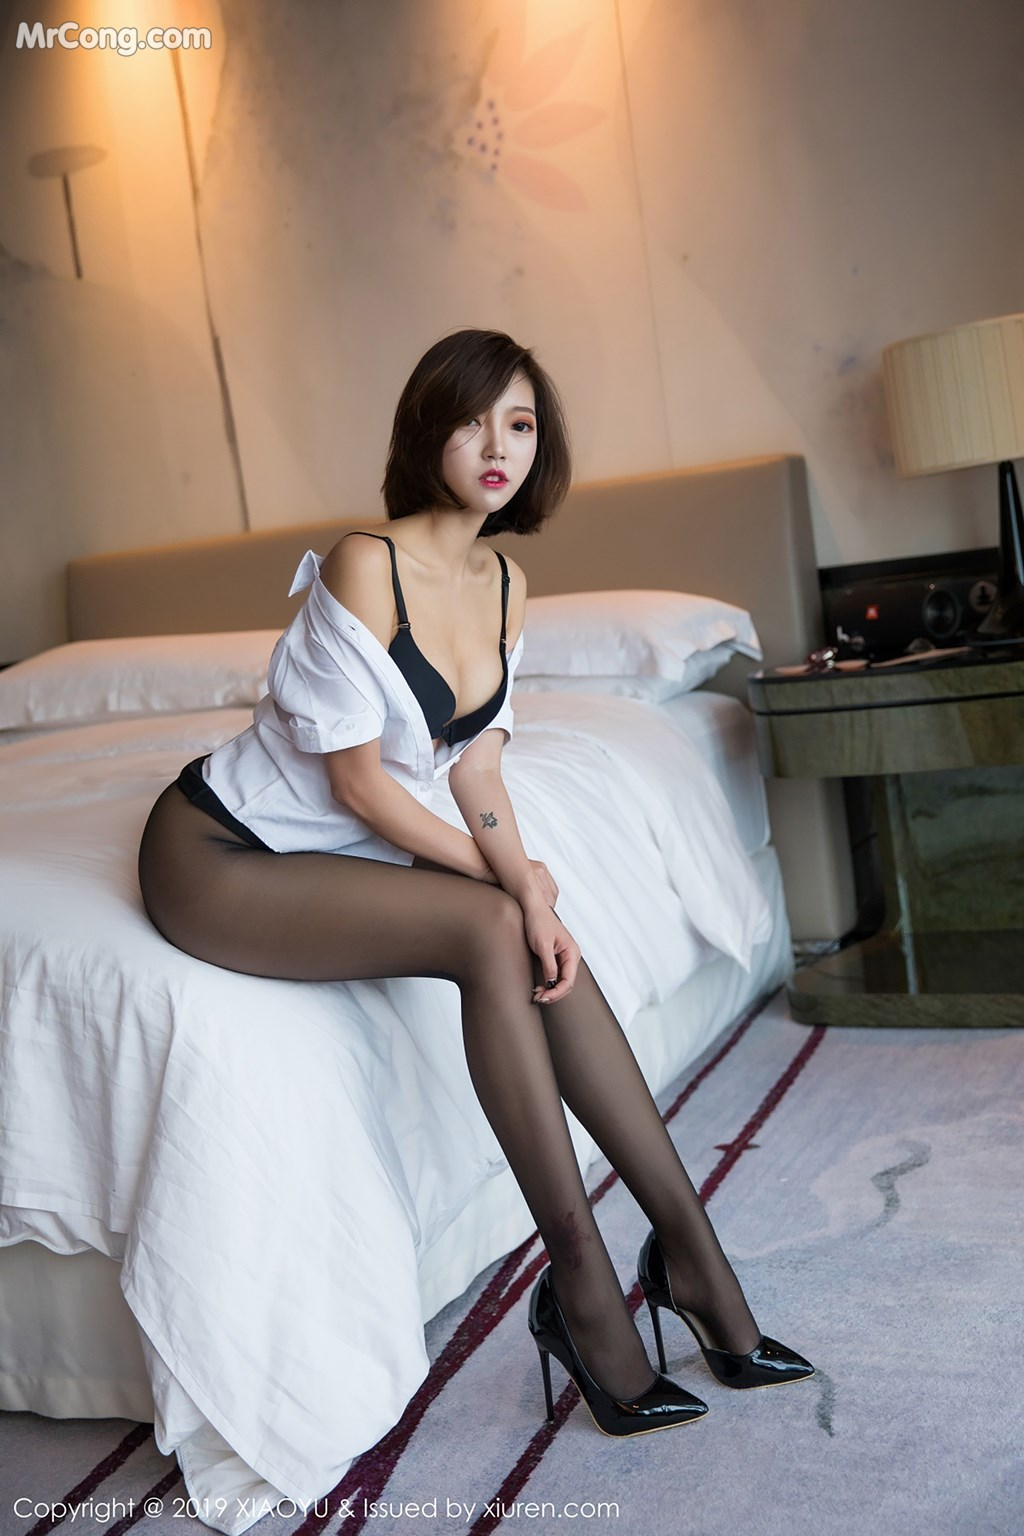 Image XiaoYu-Vol.032-LRIS-Feng-Mu-Mu-MrCong.com-002 in post XiaoYu Vol.032: Người mẫu LRIS (冯木木) (62 ảnh)